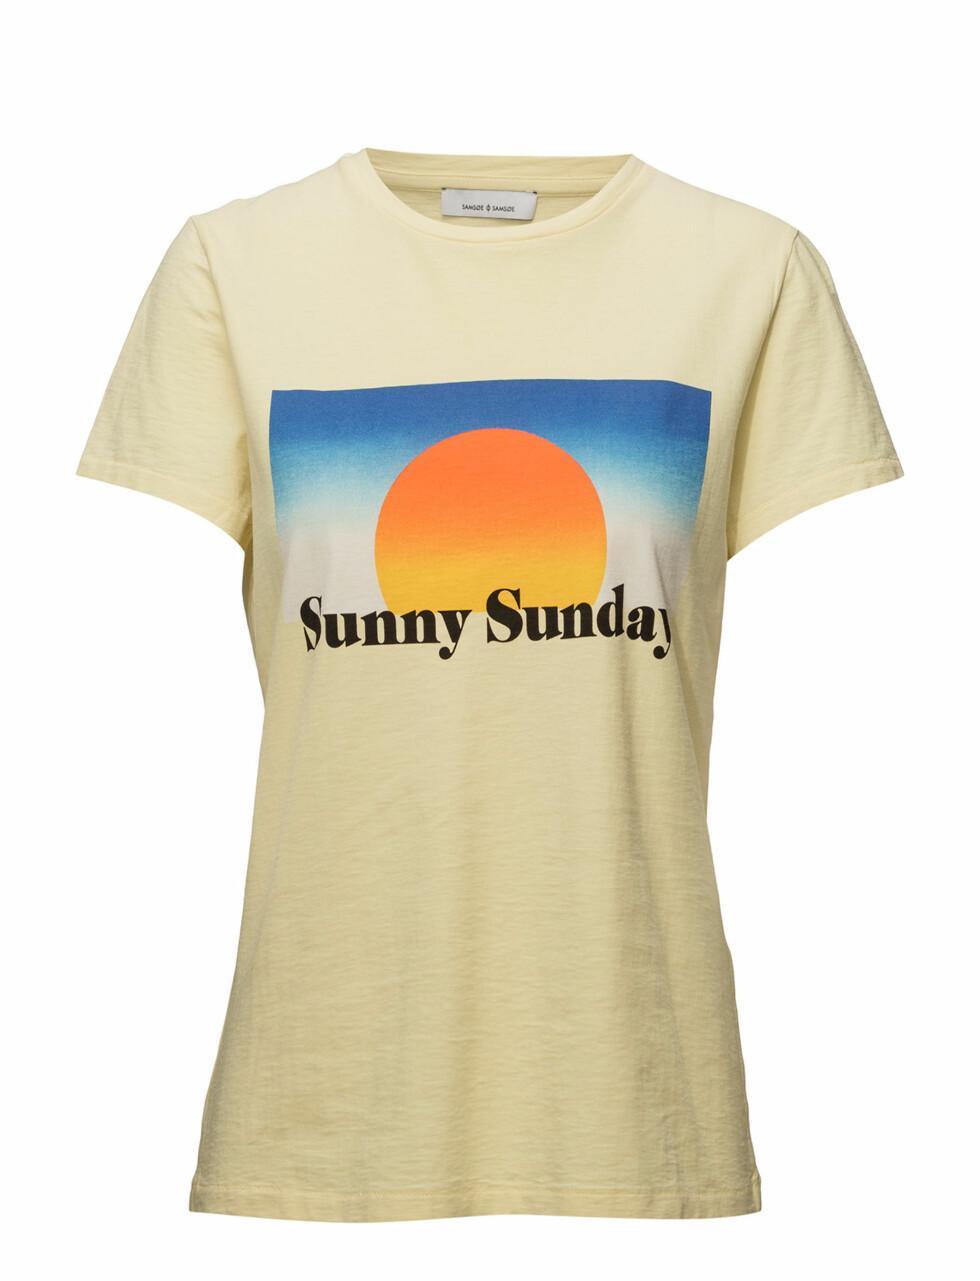 T-skjorte fra Samsøe & Samsøe via Boozt |399,-|https://www.boozt.com/no/no/modstrom/glass-t-shirt_18122465/18122469?navId=67362&sNavId=67386&group=listing&position=1000000